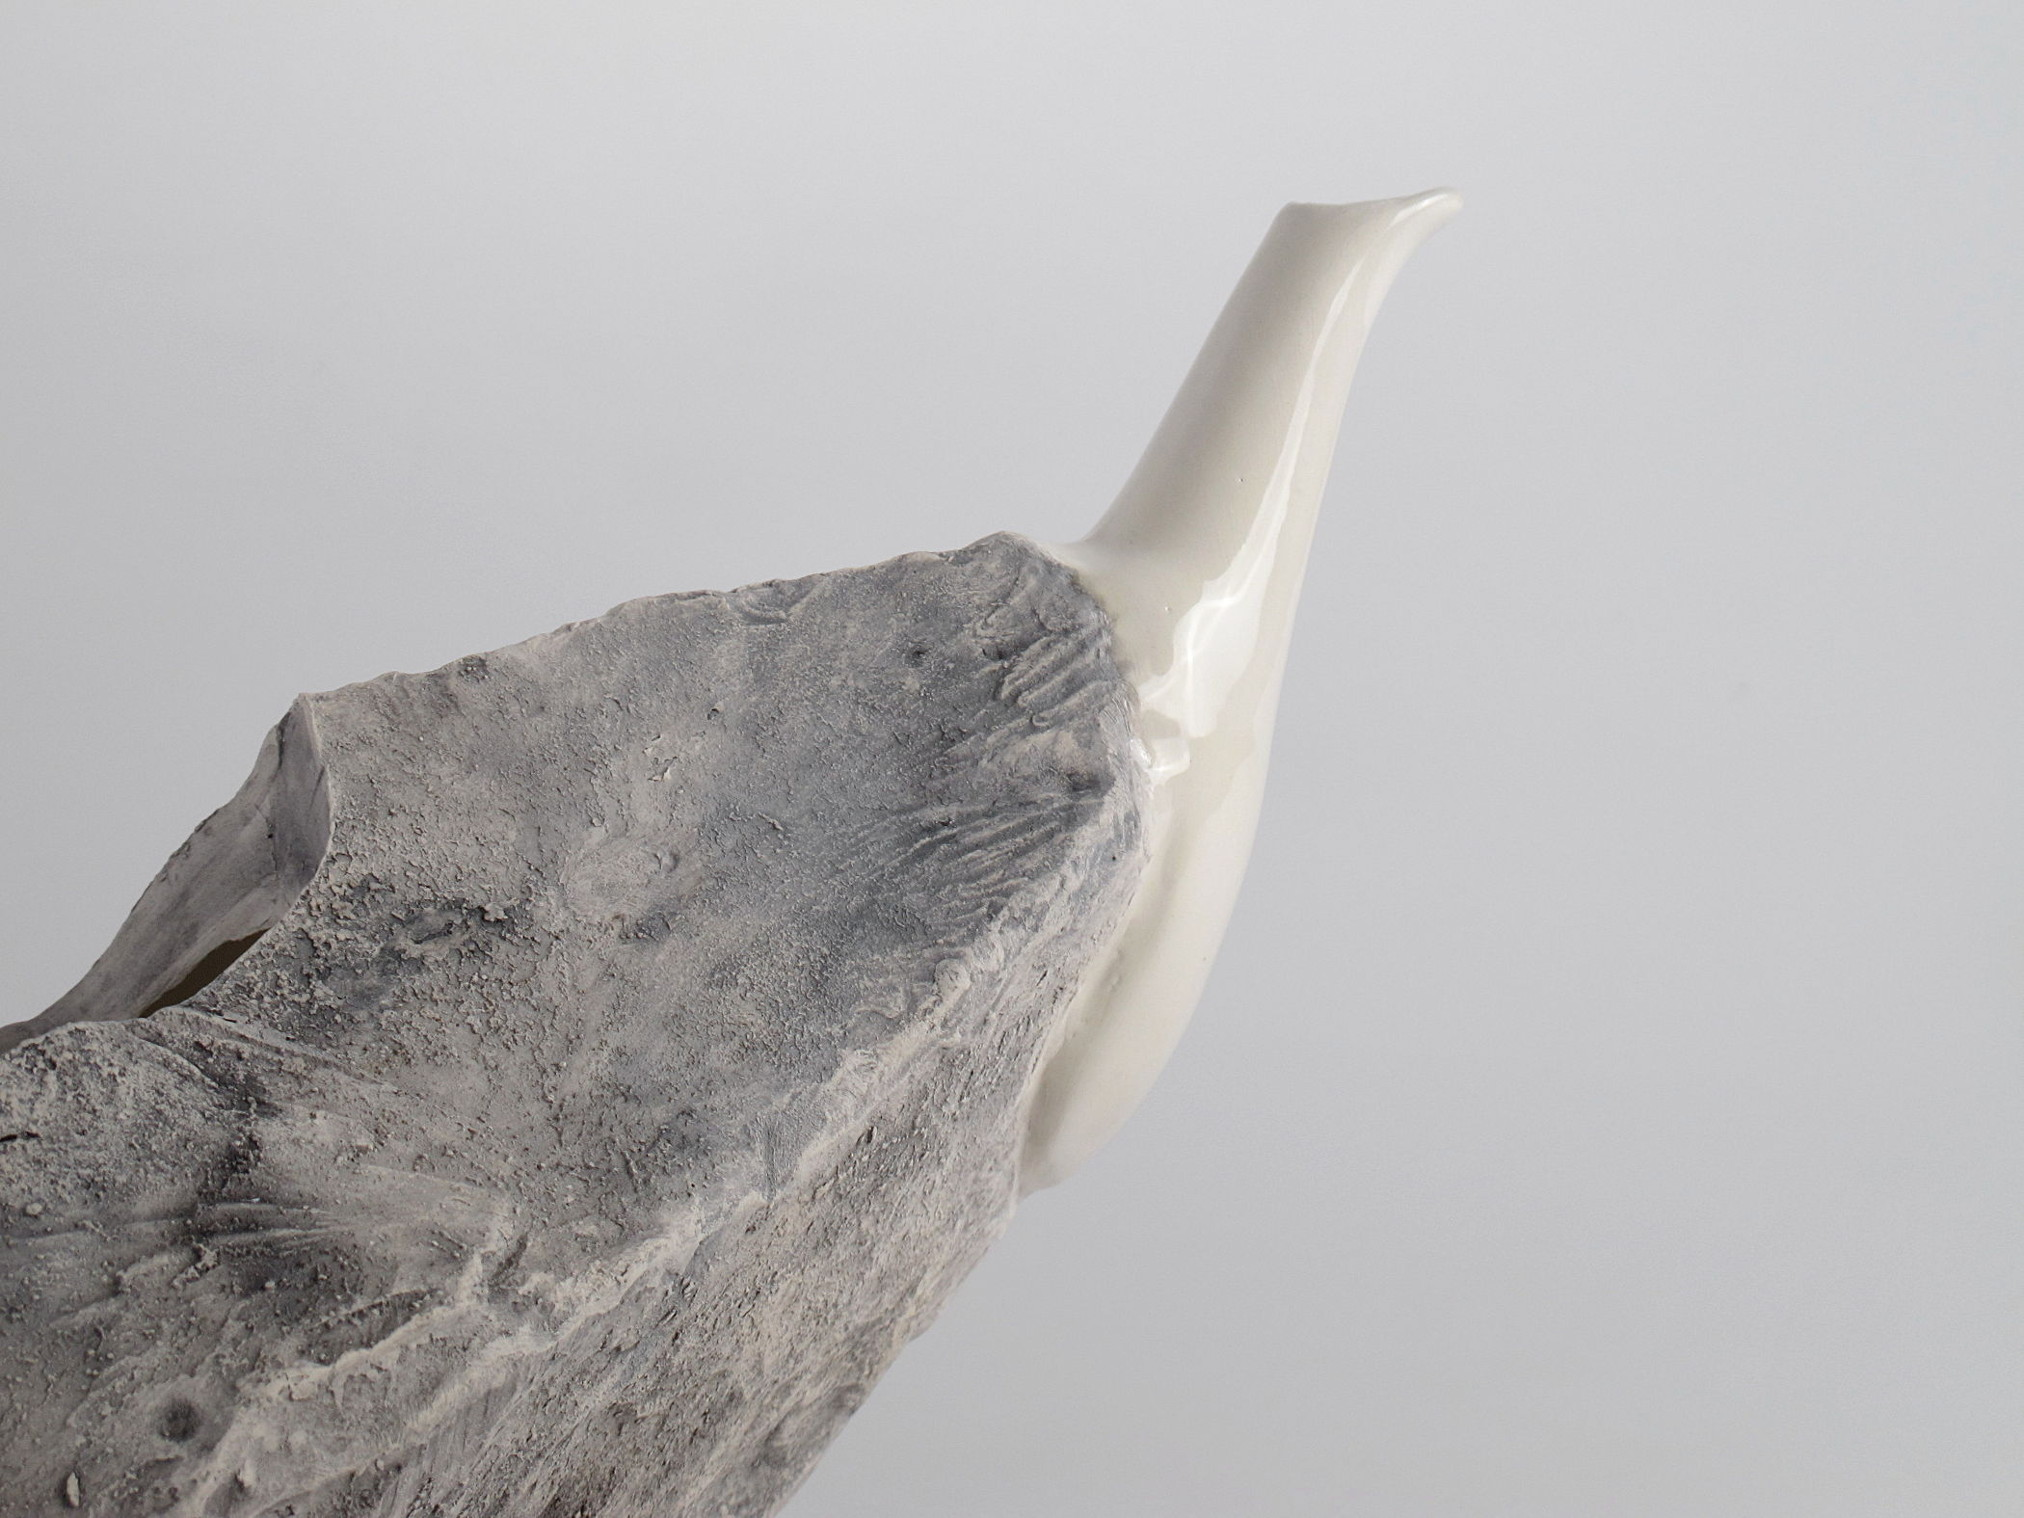 Rock Jug lapidaria contemporary art ceramic contemporary artists Caterina Sbrana Gabriele Mallegni